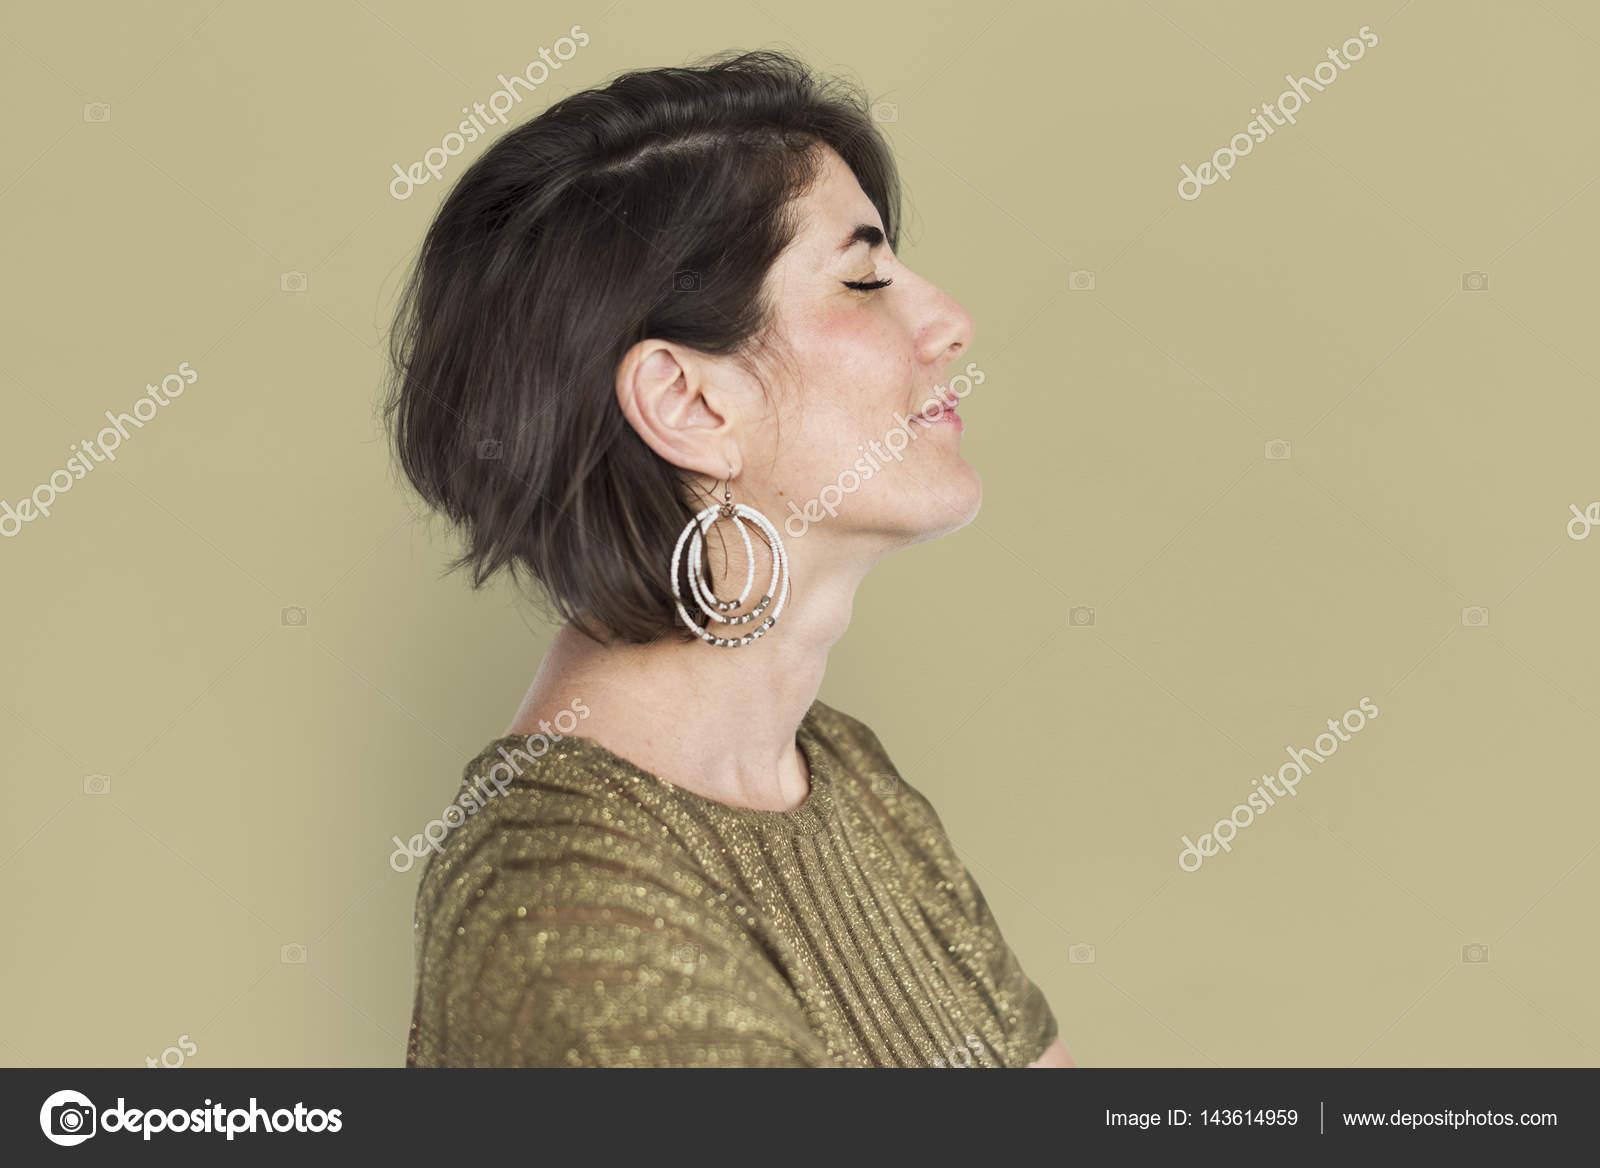 matura donna caucasica — Foto Stock © Rawpixel  143614959 6920f0448834